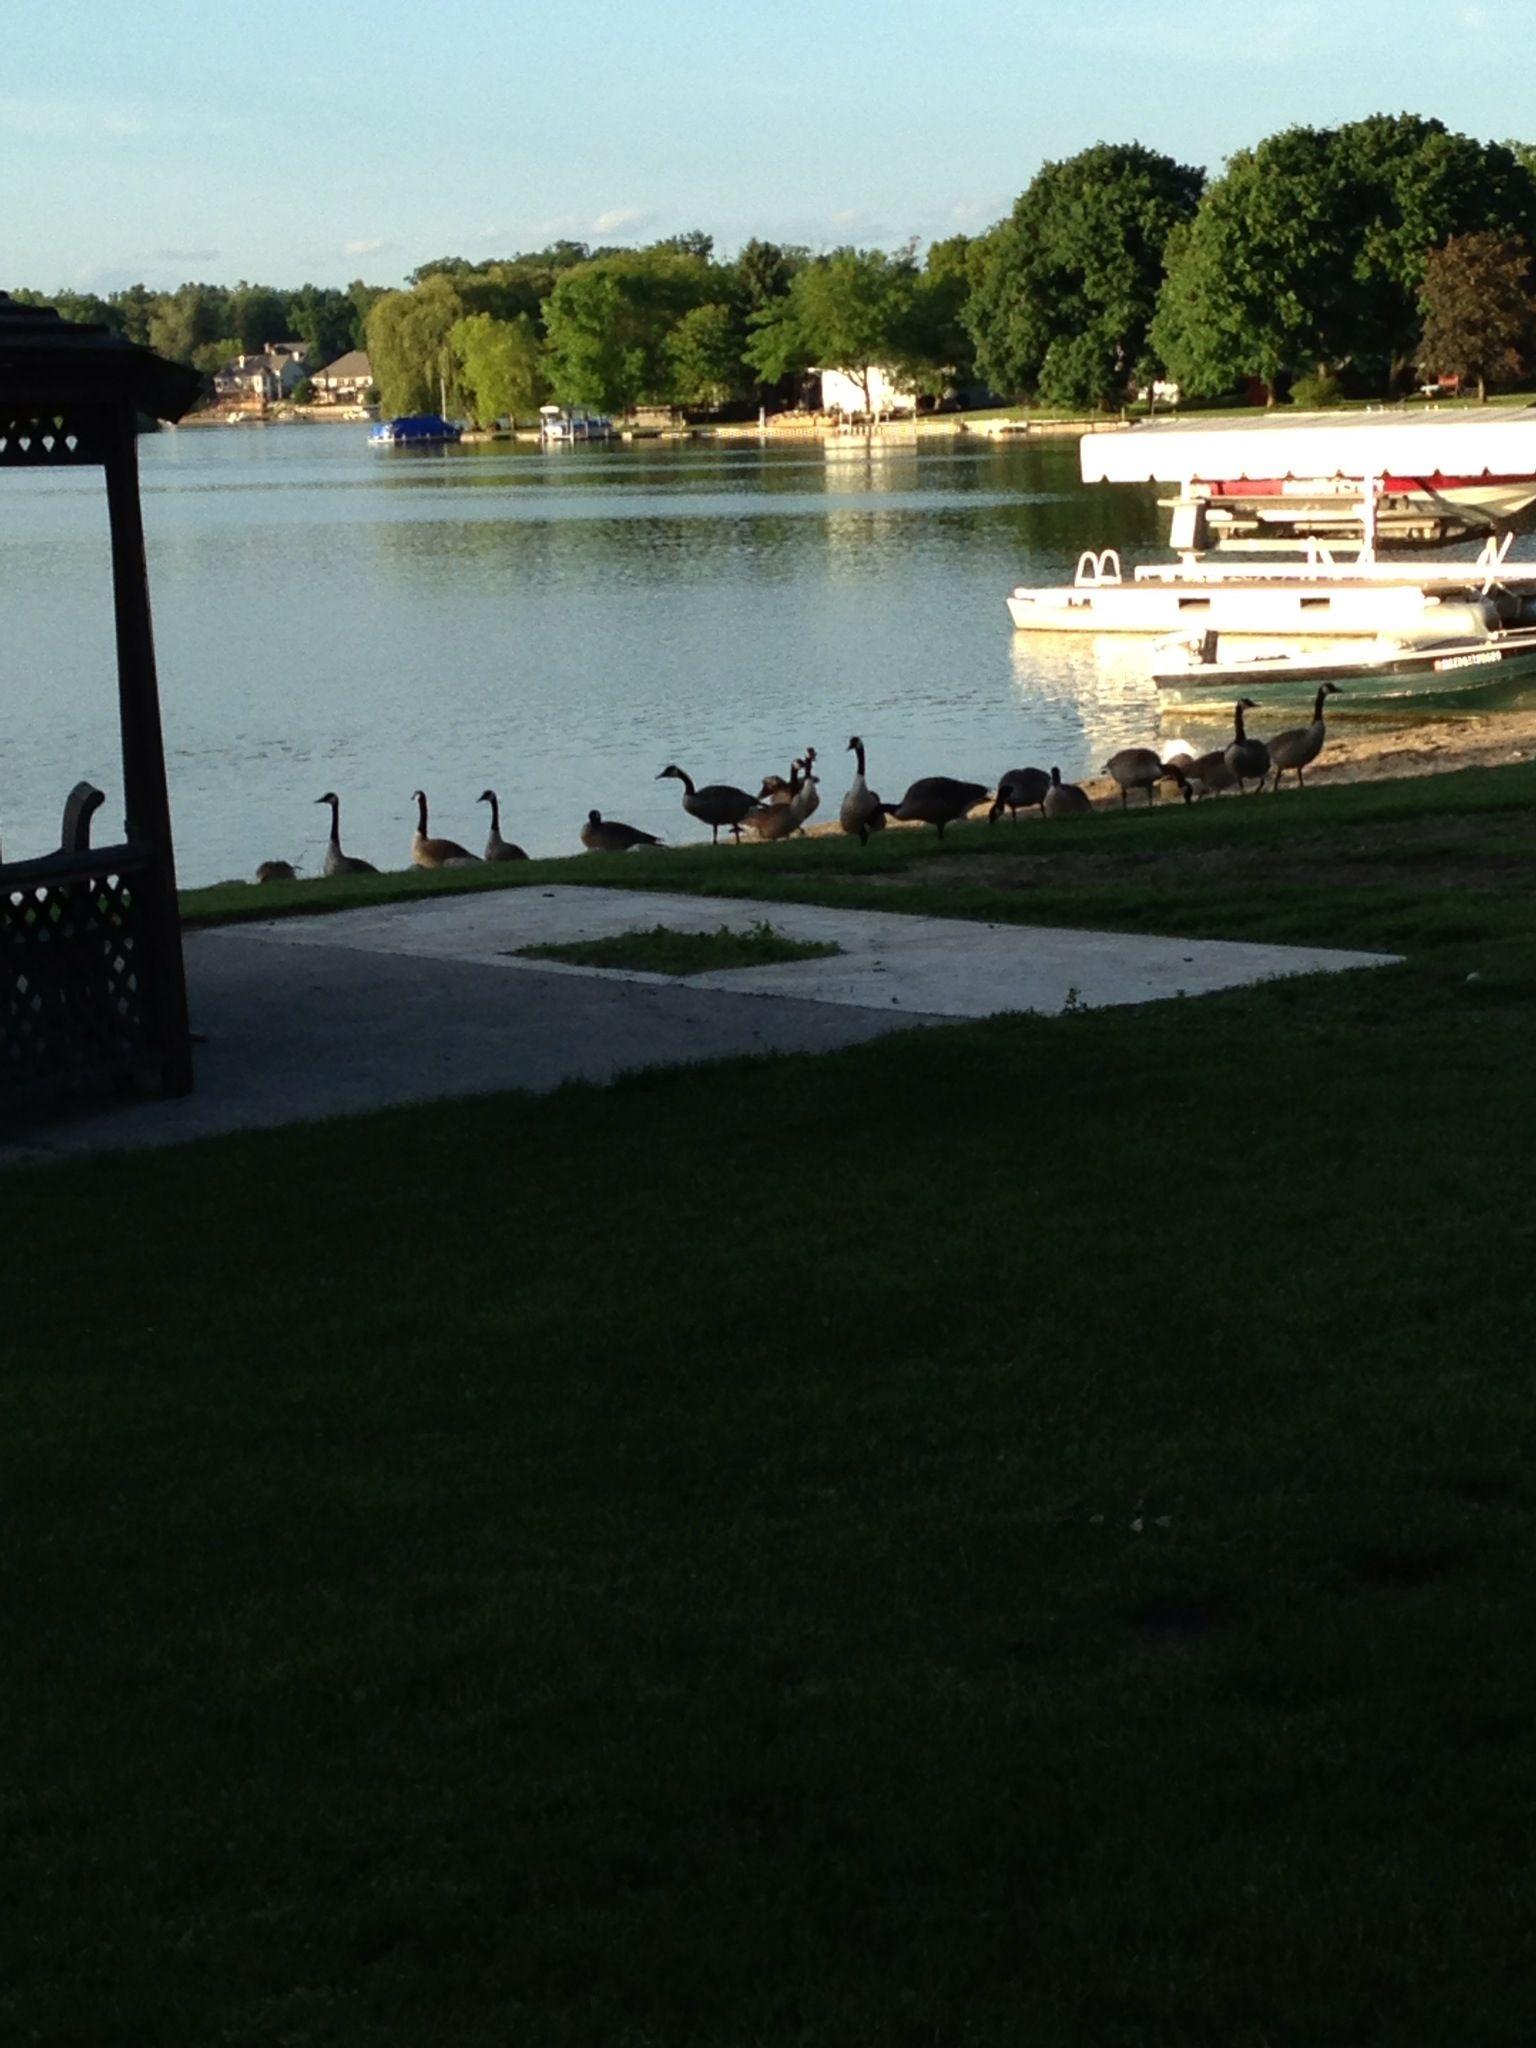 Geese at Thompson Lake.